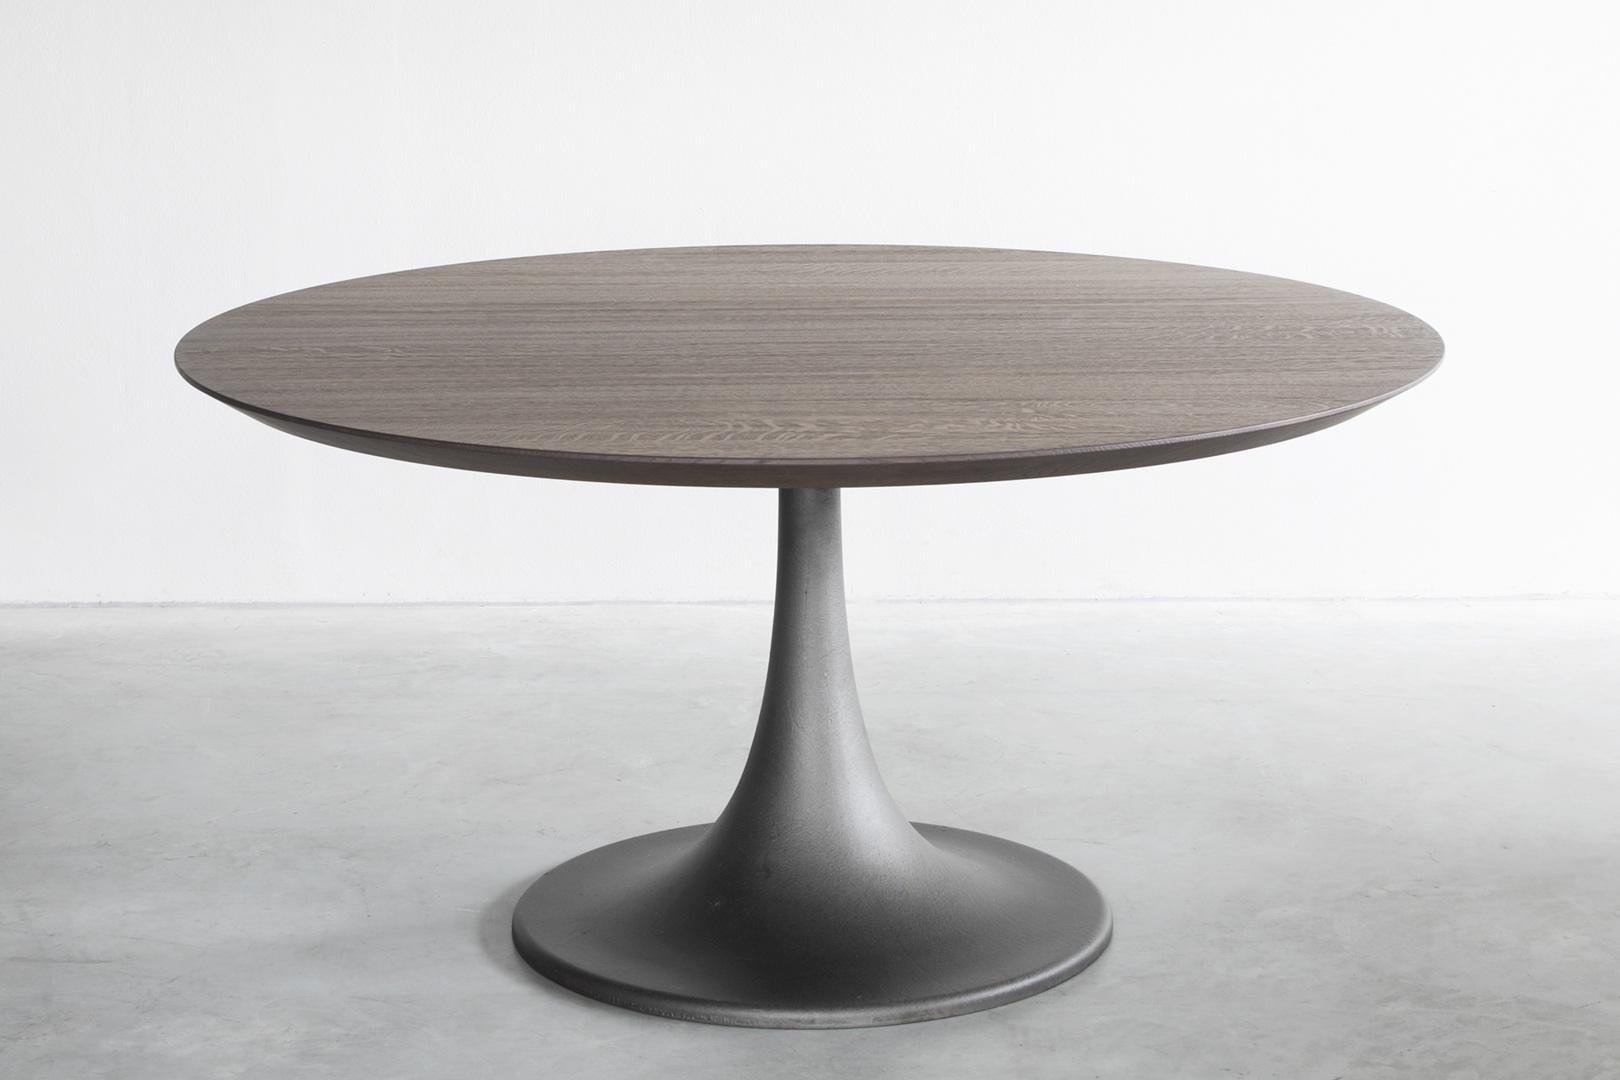 Crude iron dining table - 01.JPG